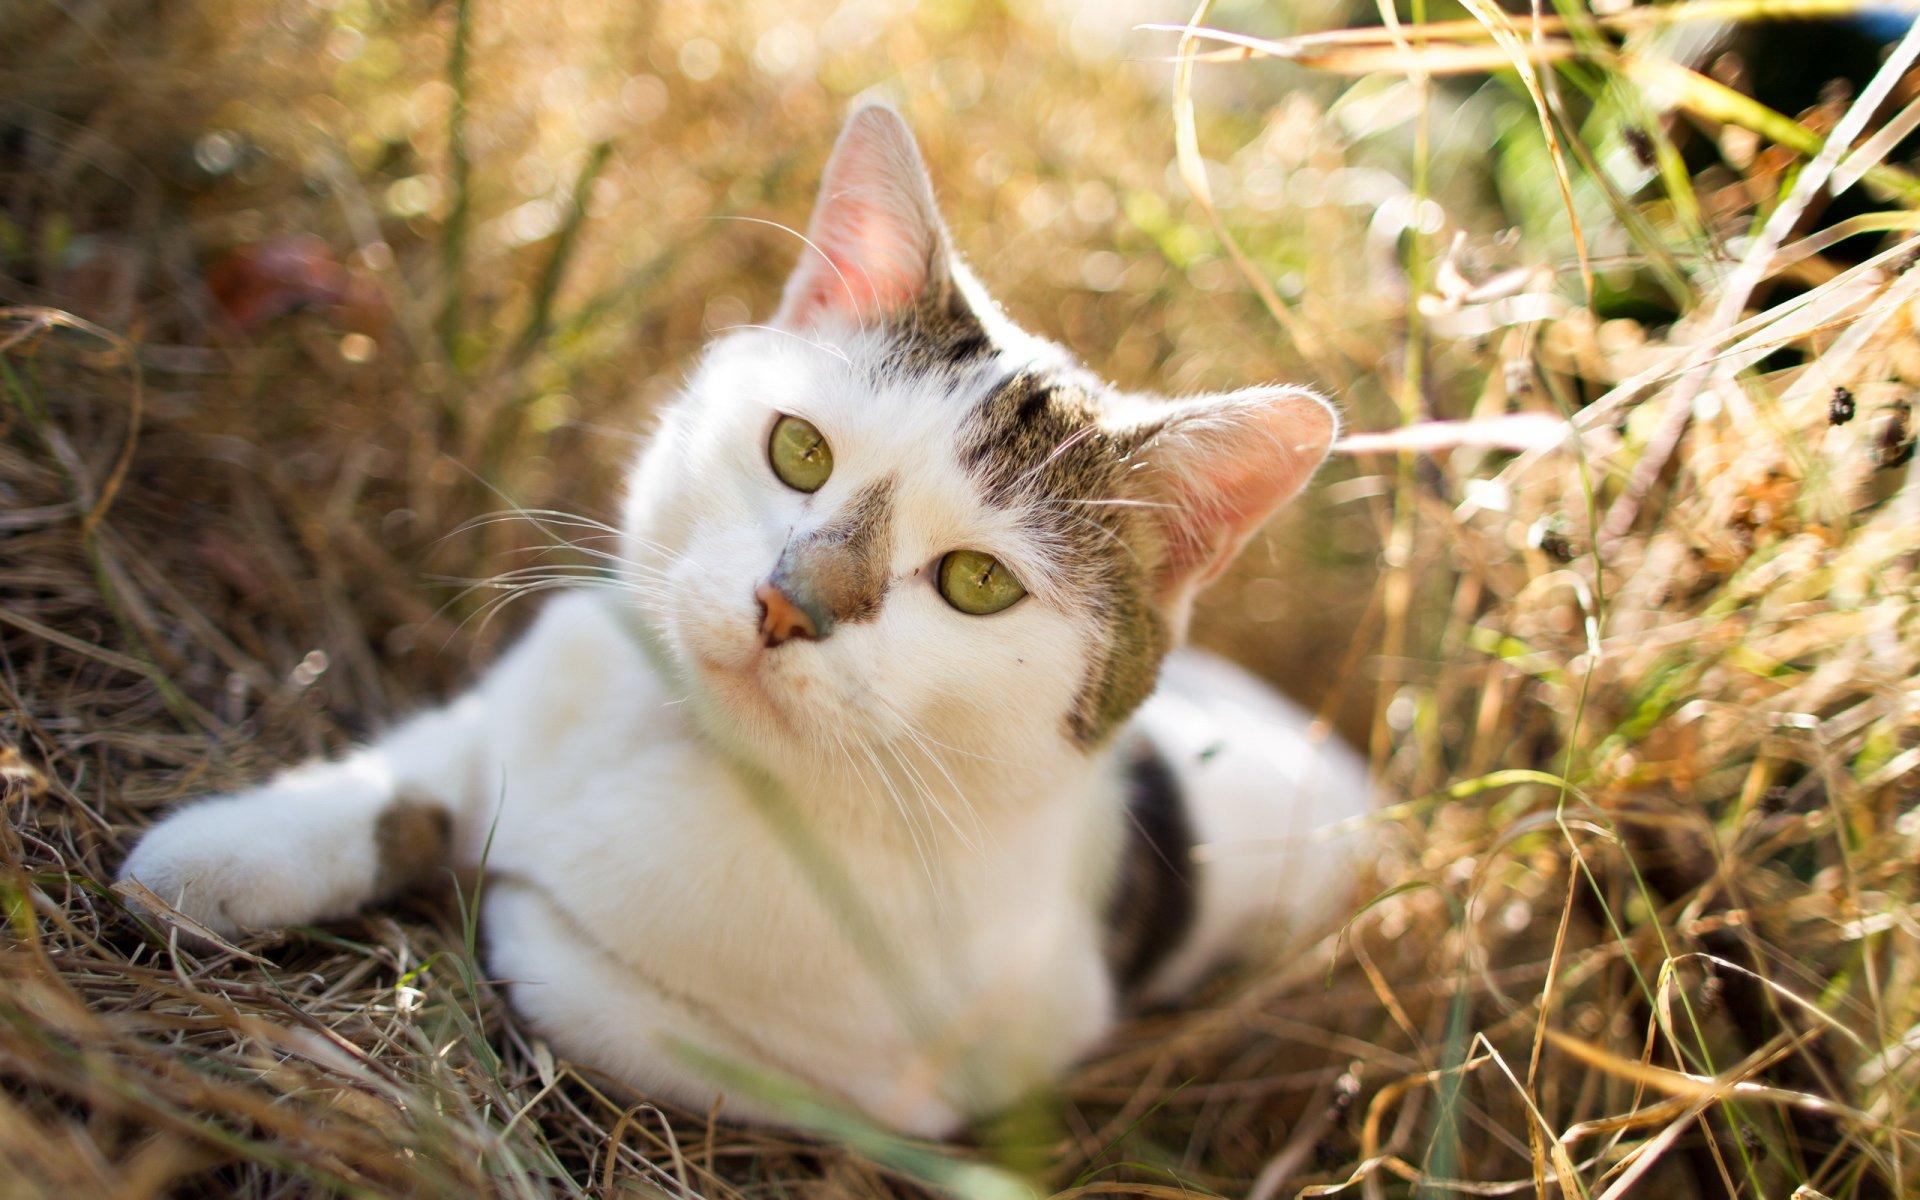 именно красивые картинки кошки на природе тренеру знакома ситуация